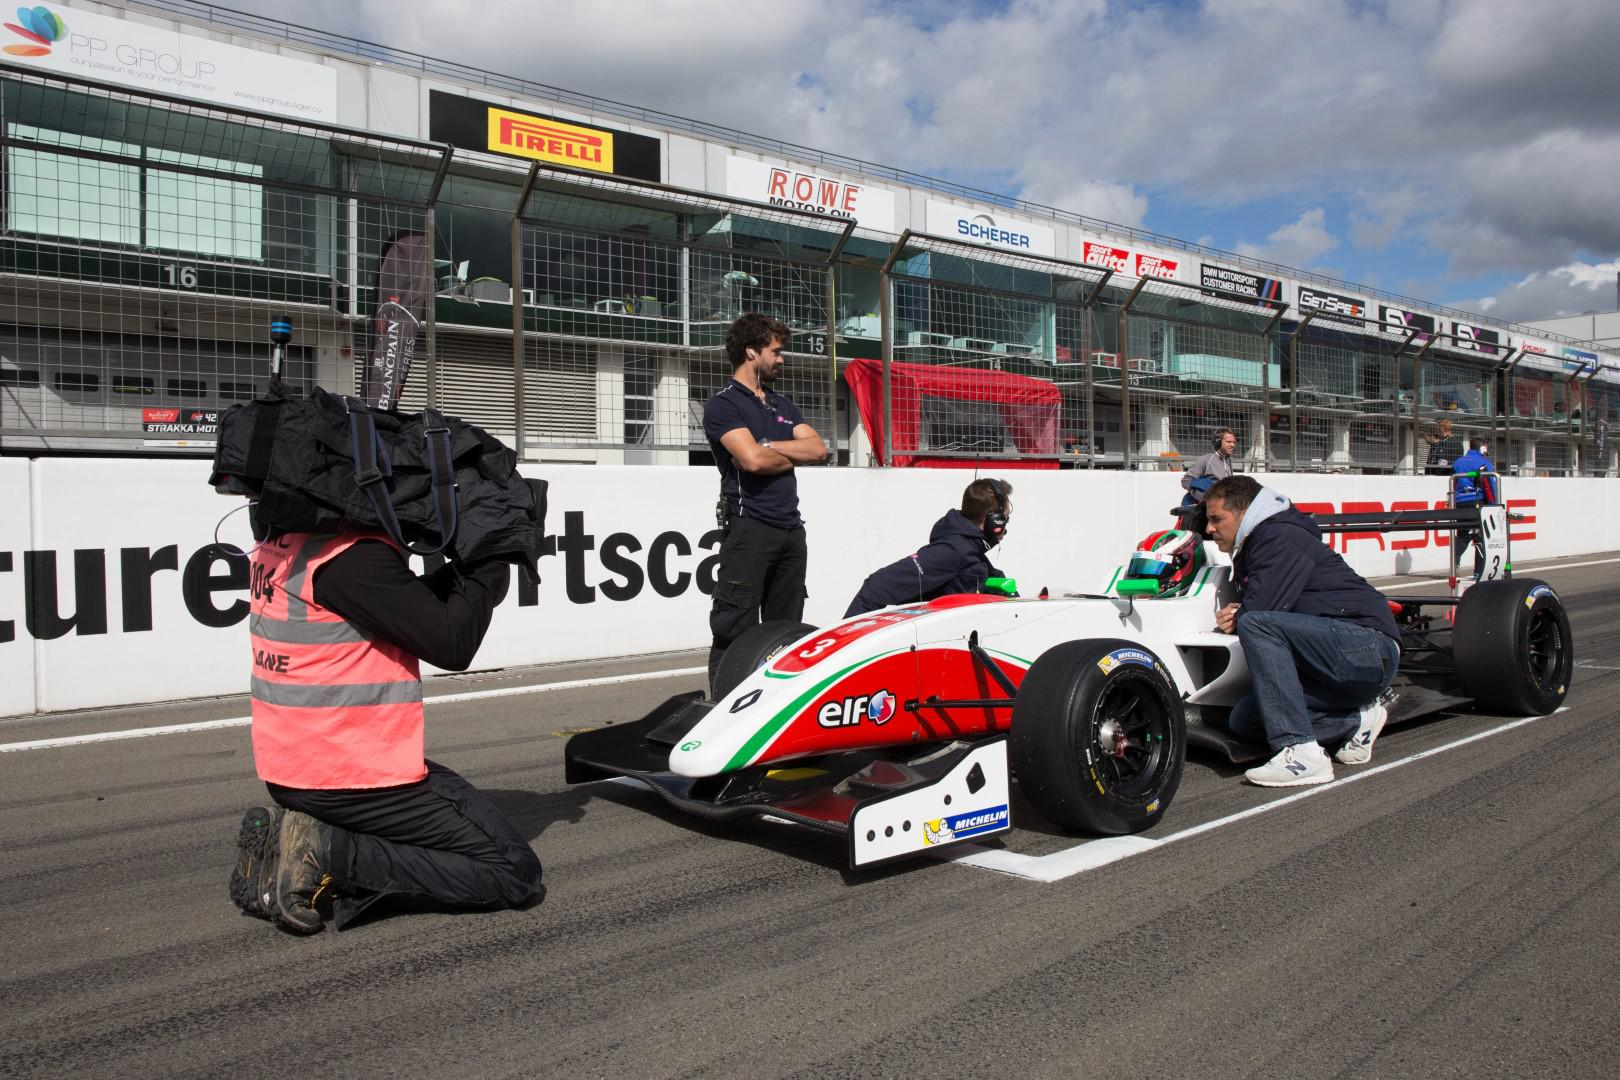 michael-benyahia-round-5-amp-6-championnat-nec-formule-renault-2-0-422-3.jpg